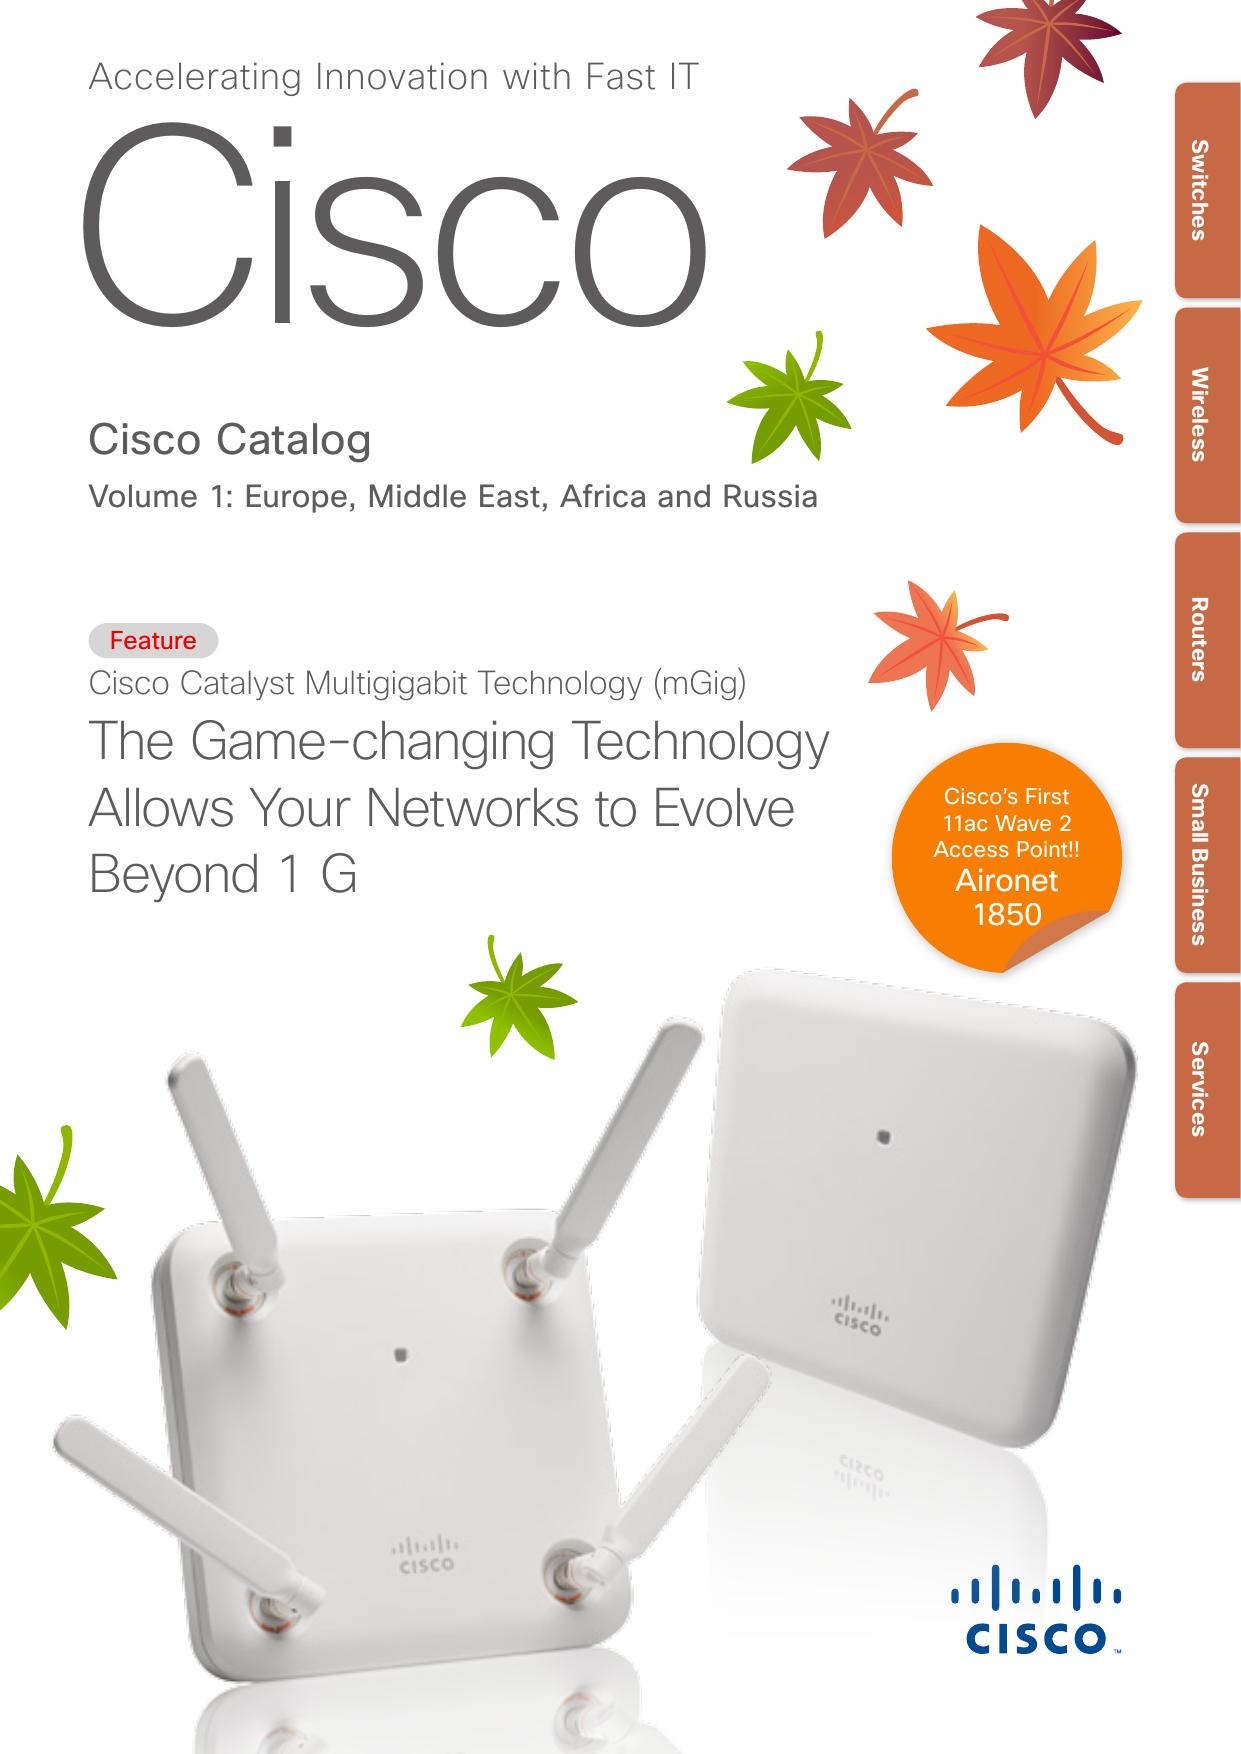 1 Year Warranty Cisco C6800IA-48FPD 48-Port 1GB PoE Instant Access 6800 Switch